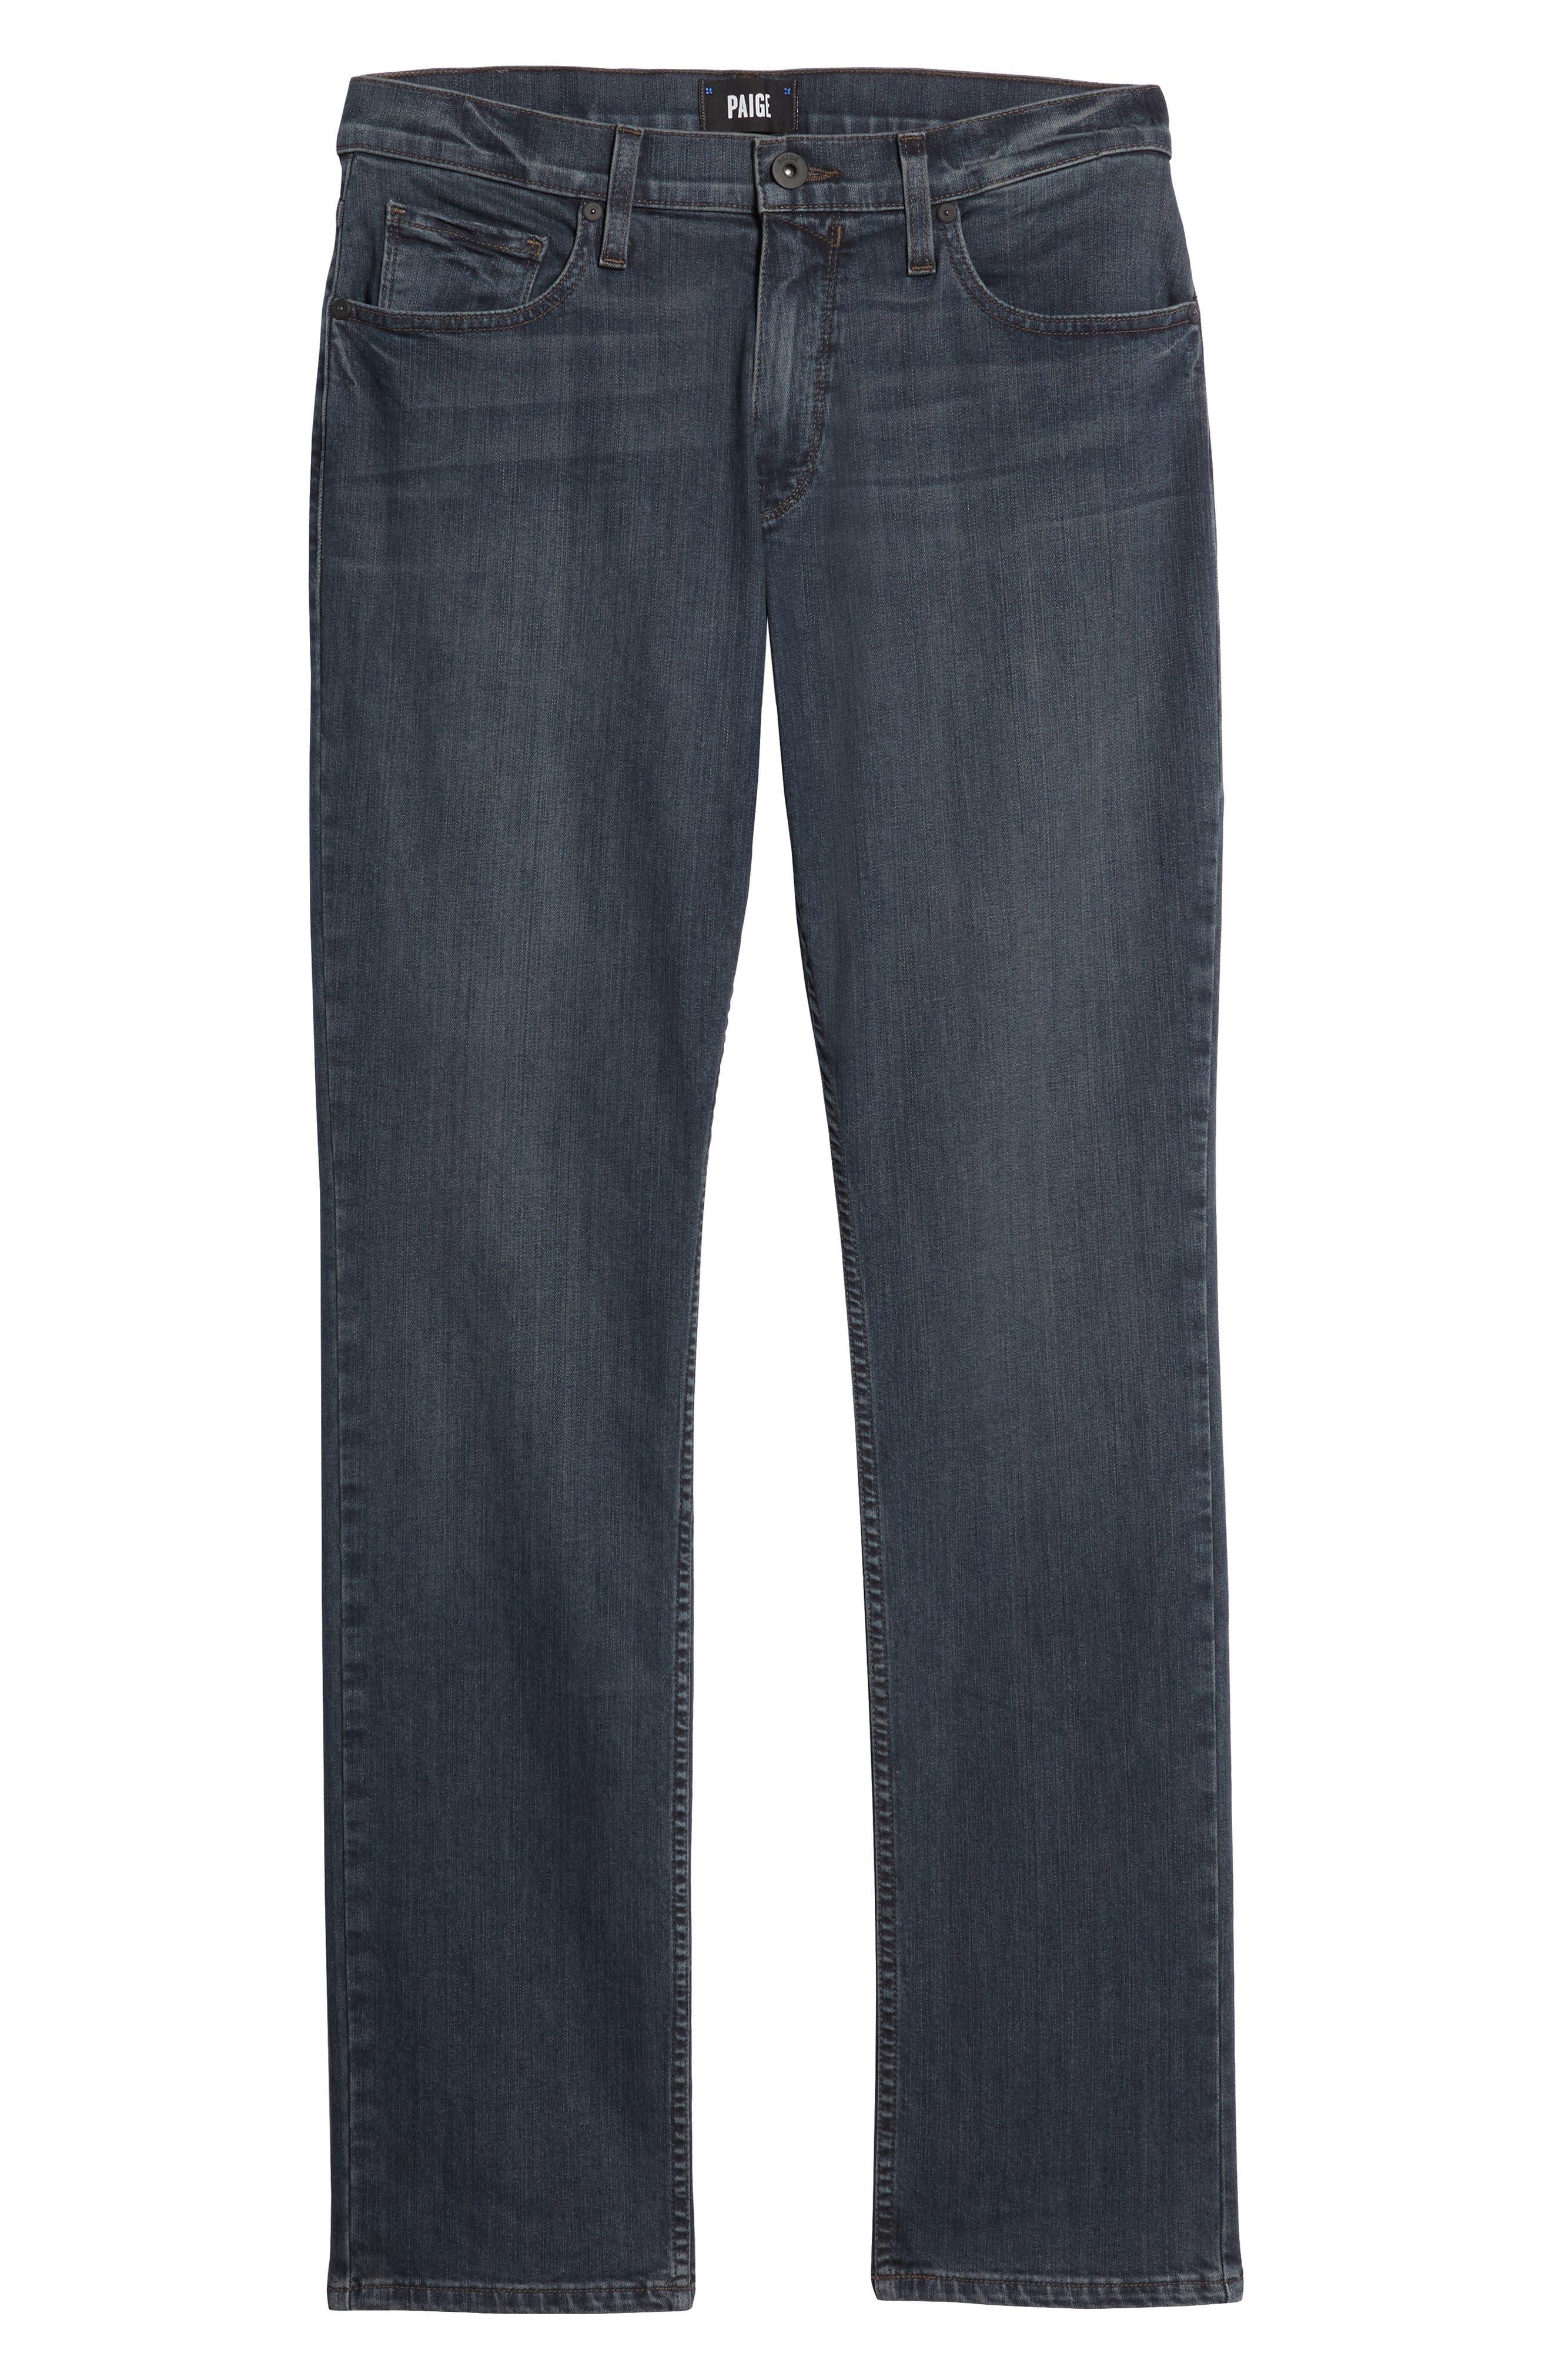 Legacy - Federal Slim Straight Leg Jeans,                             Alternate thumbnail 6, color,                             400